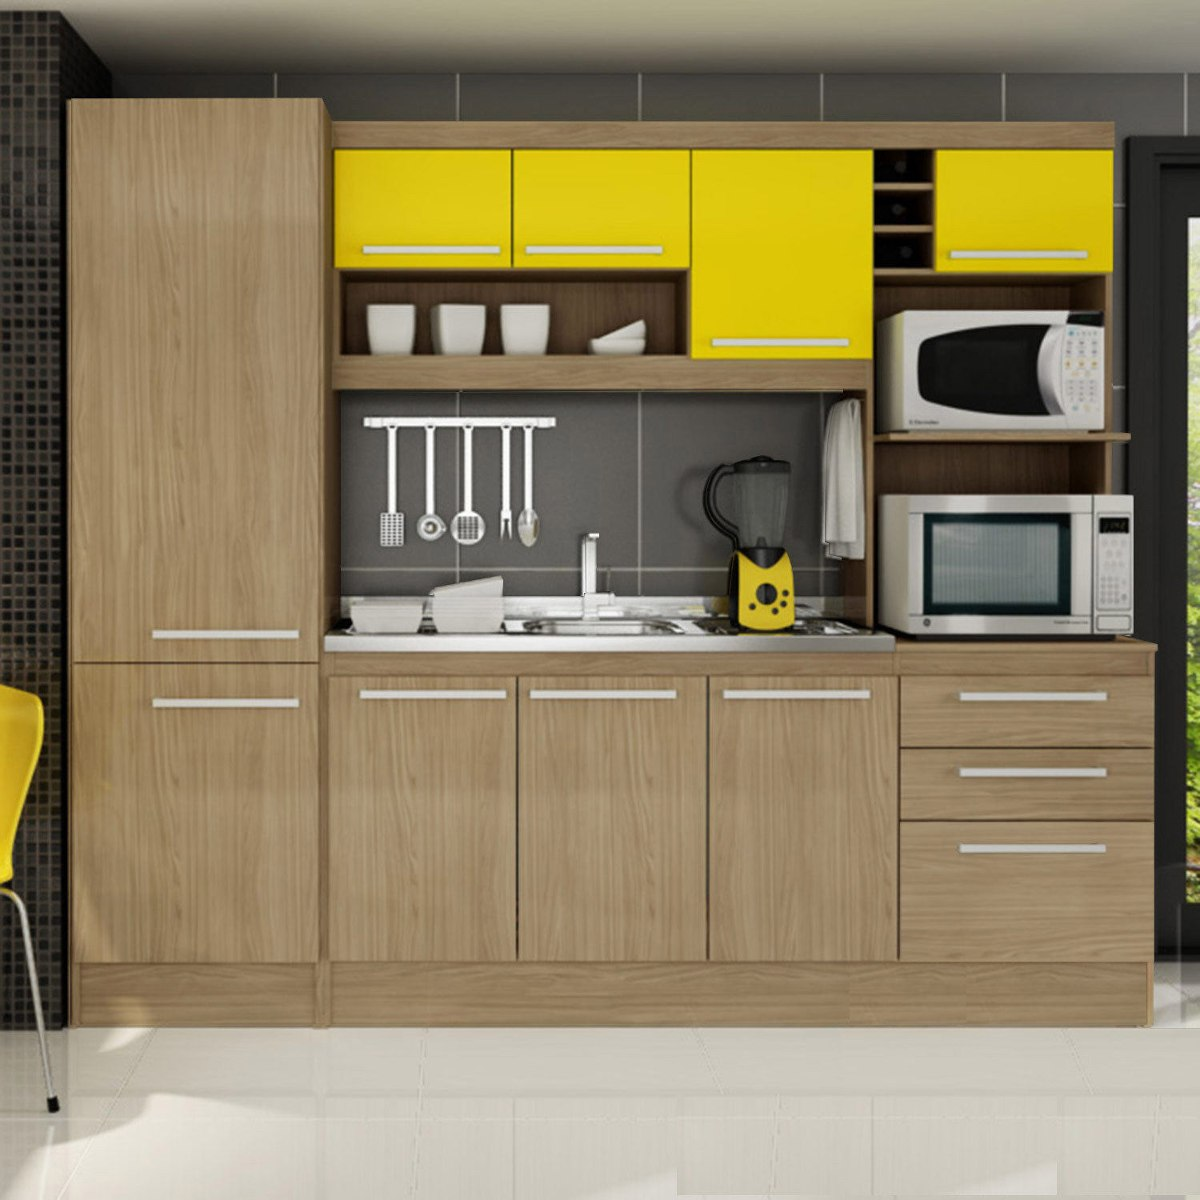 Cozinha Compacta Sevilha 210 Gralar N O Acompanha Cuba R 869 90